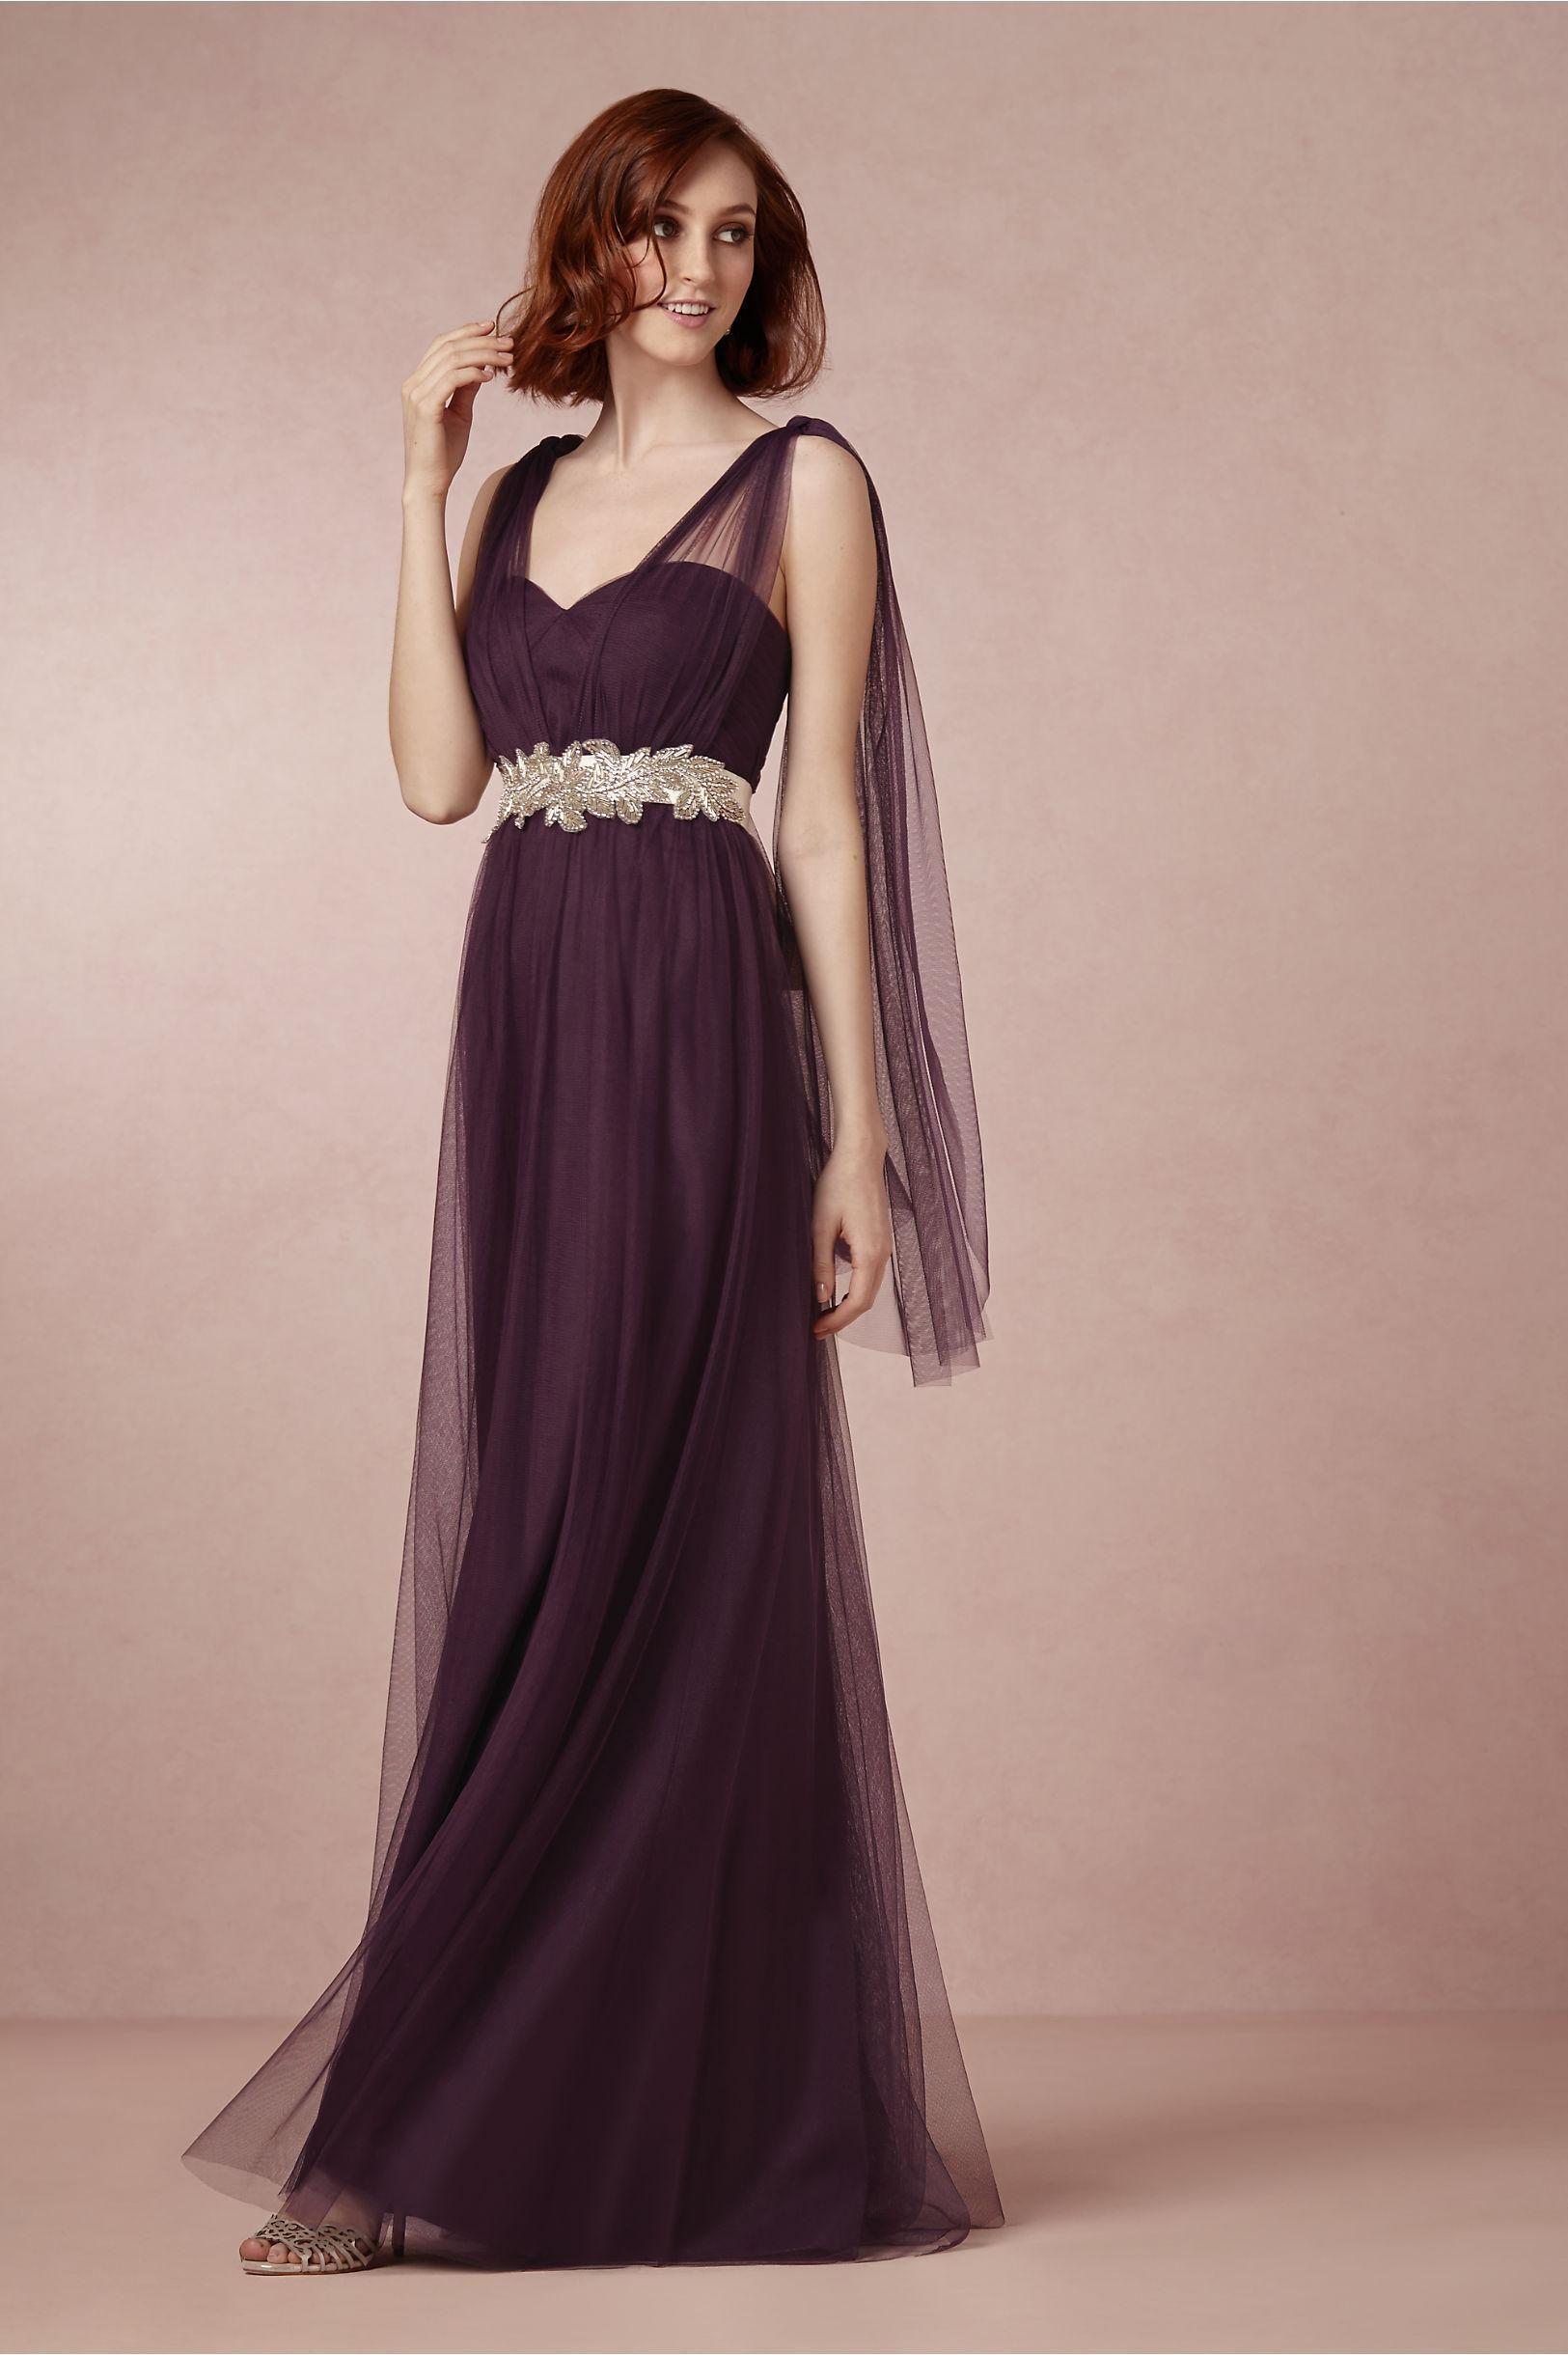 Annabelle dress in sugar plum from bhldn convertible bridesmaids plum purple tulle floor length bridesmaids dress annabelle dress from bhldn ombrellifo Images